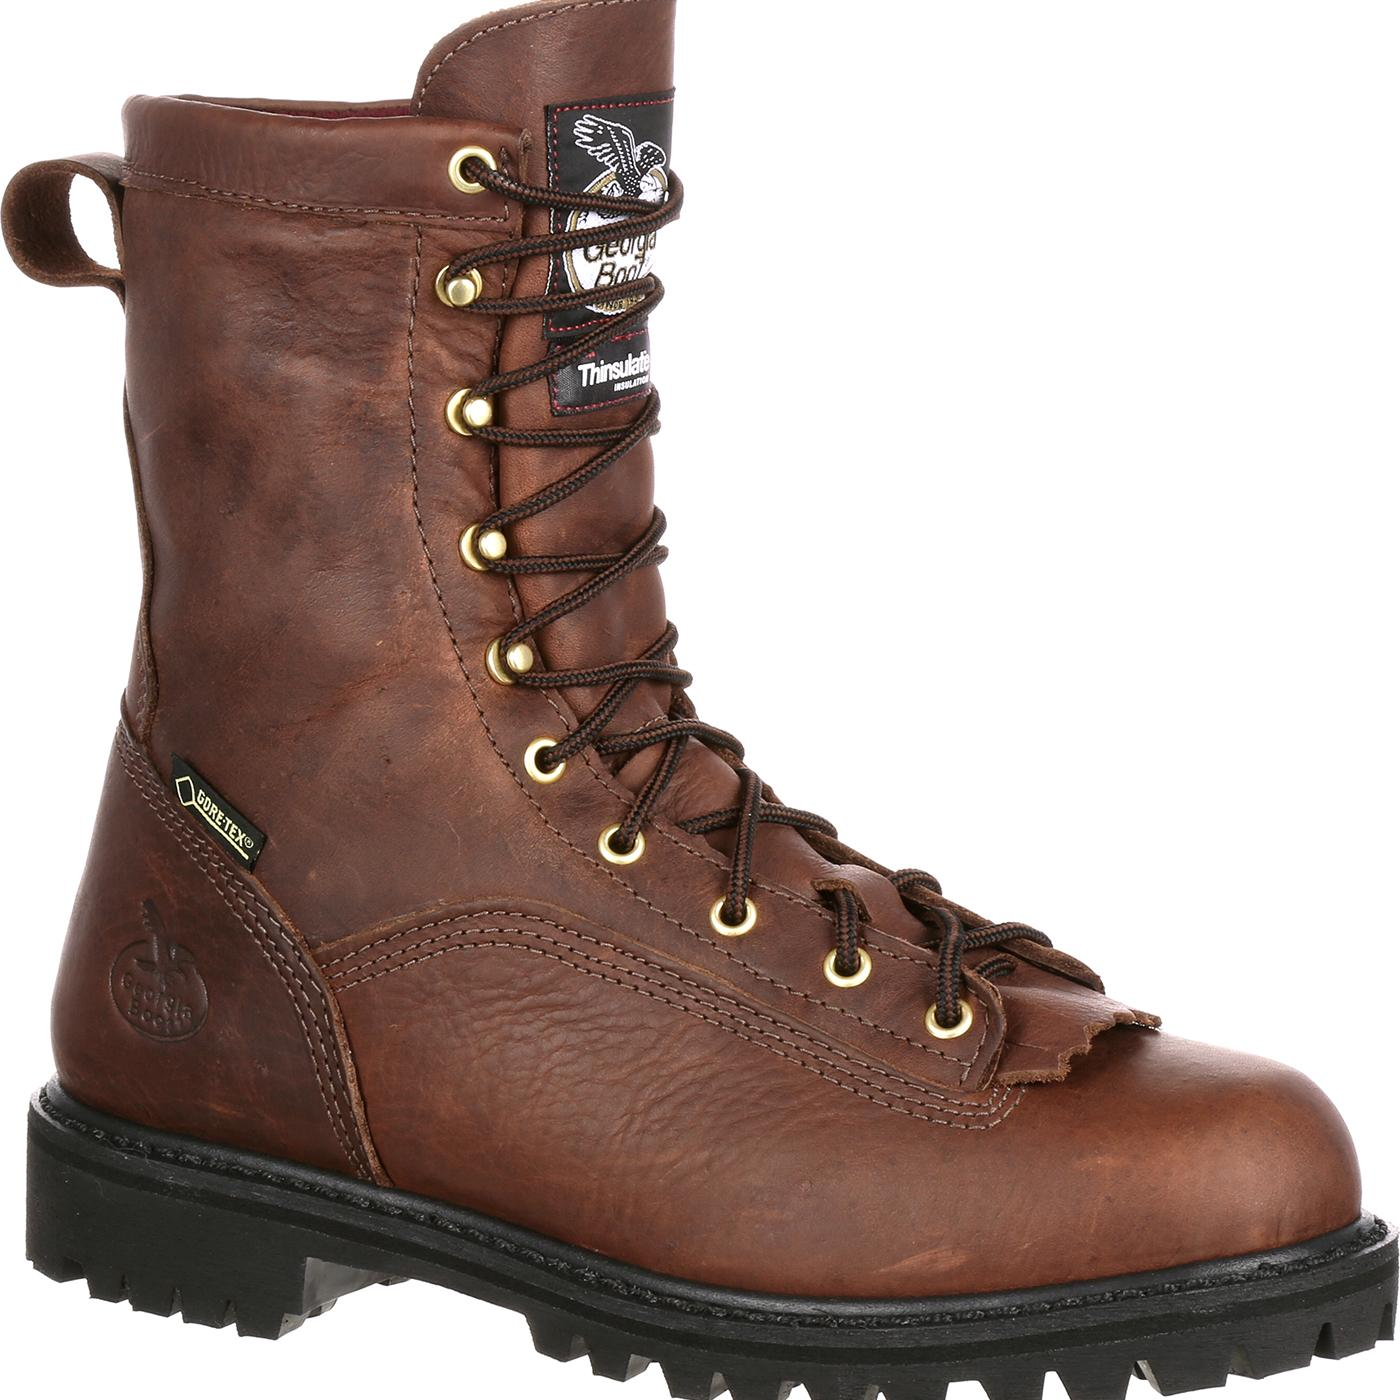 Best Insulated Boots Men